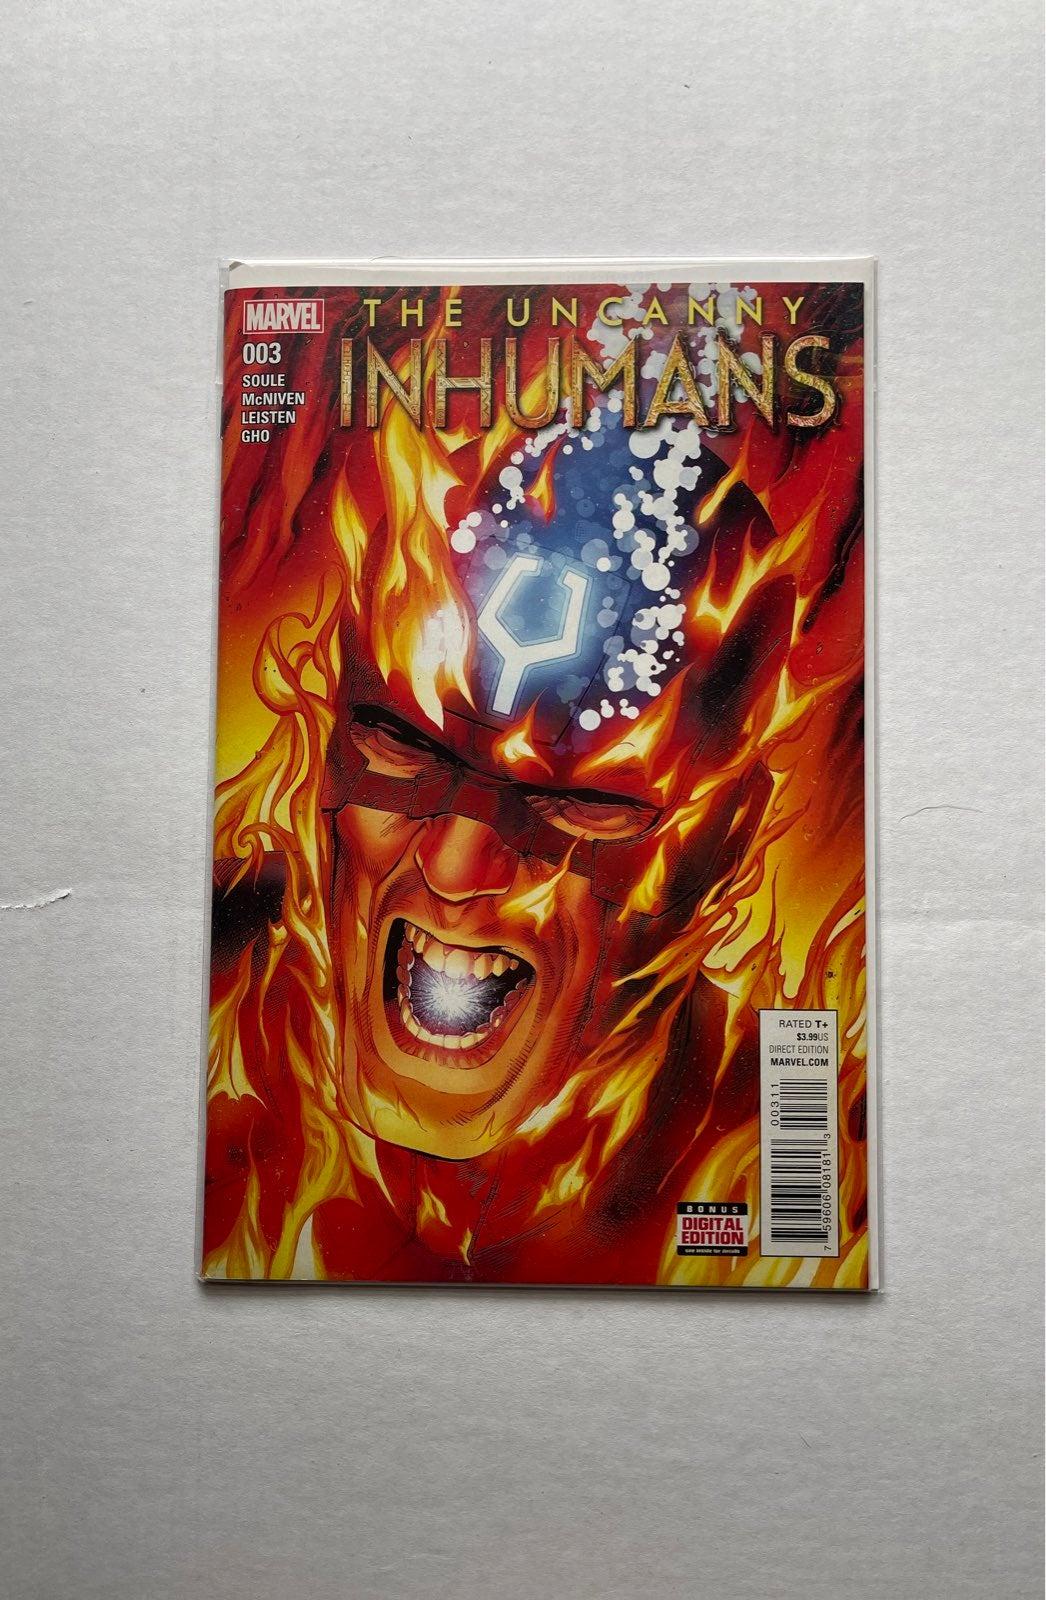 marvel uncanny inhumans #3 comic book